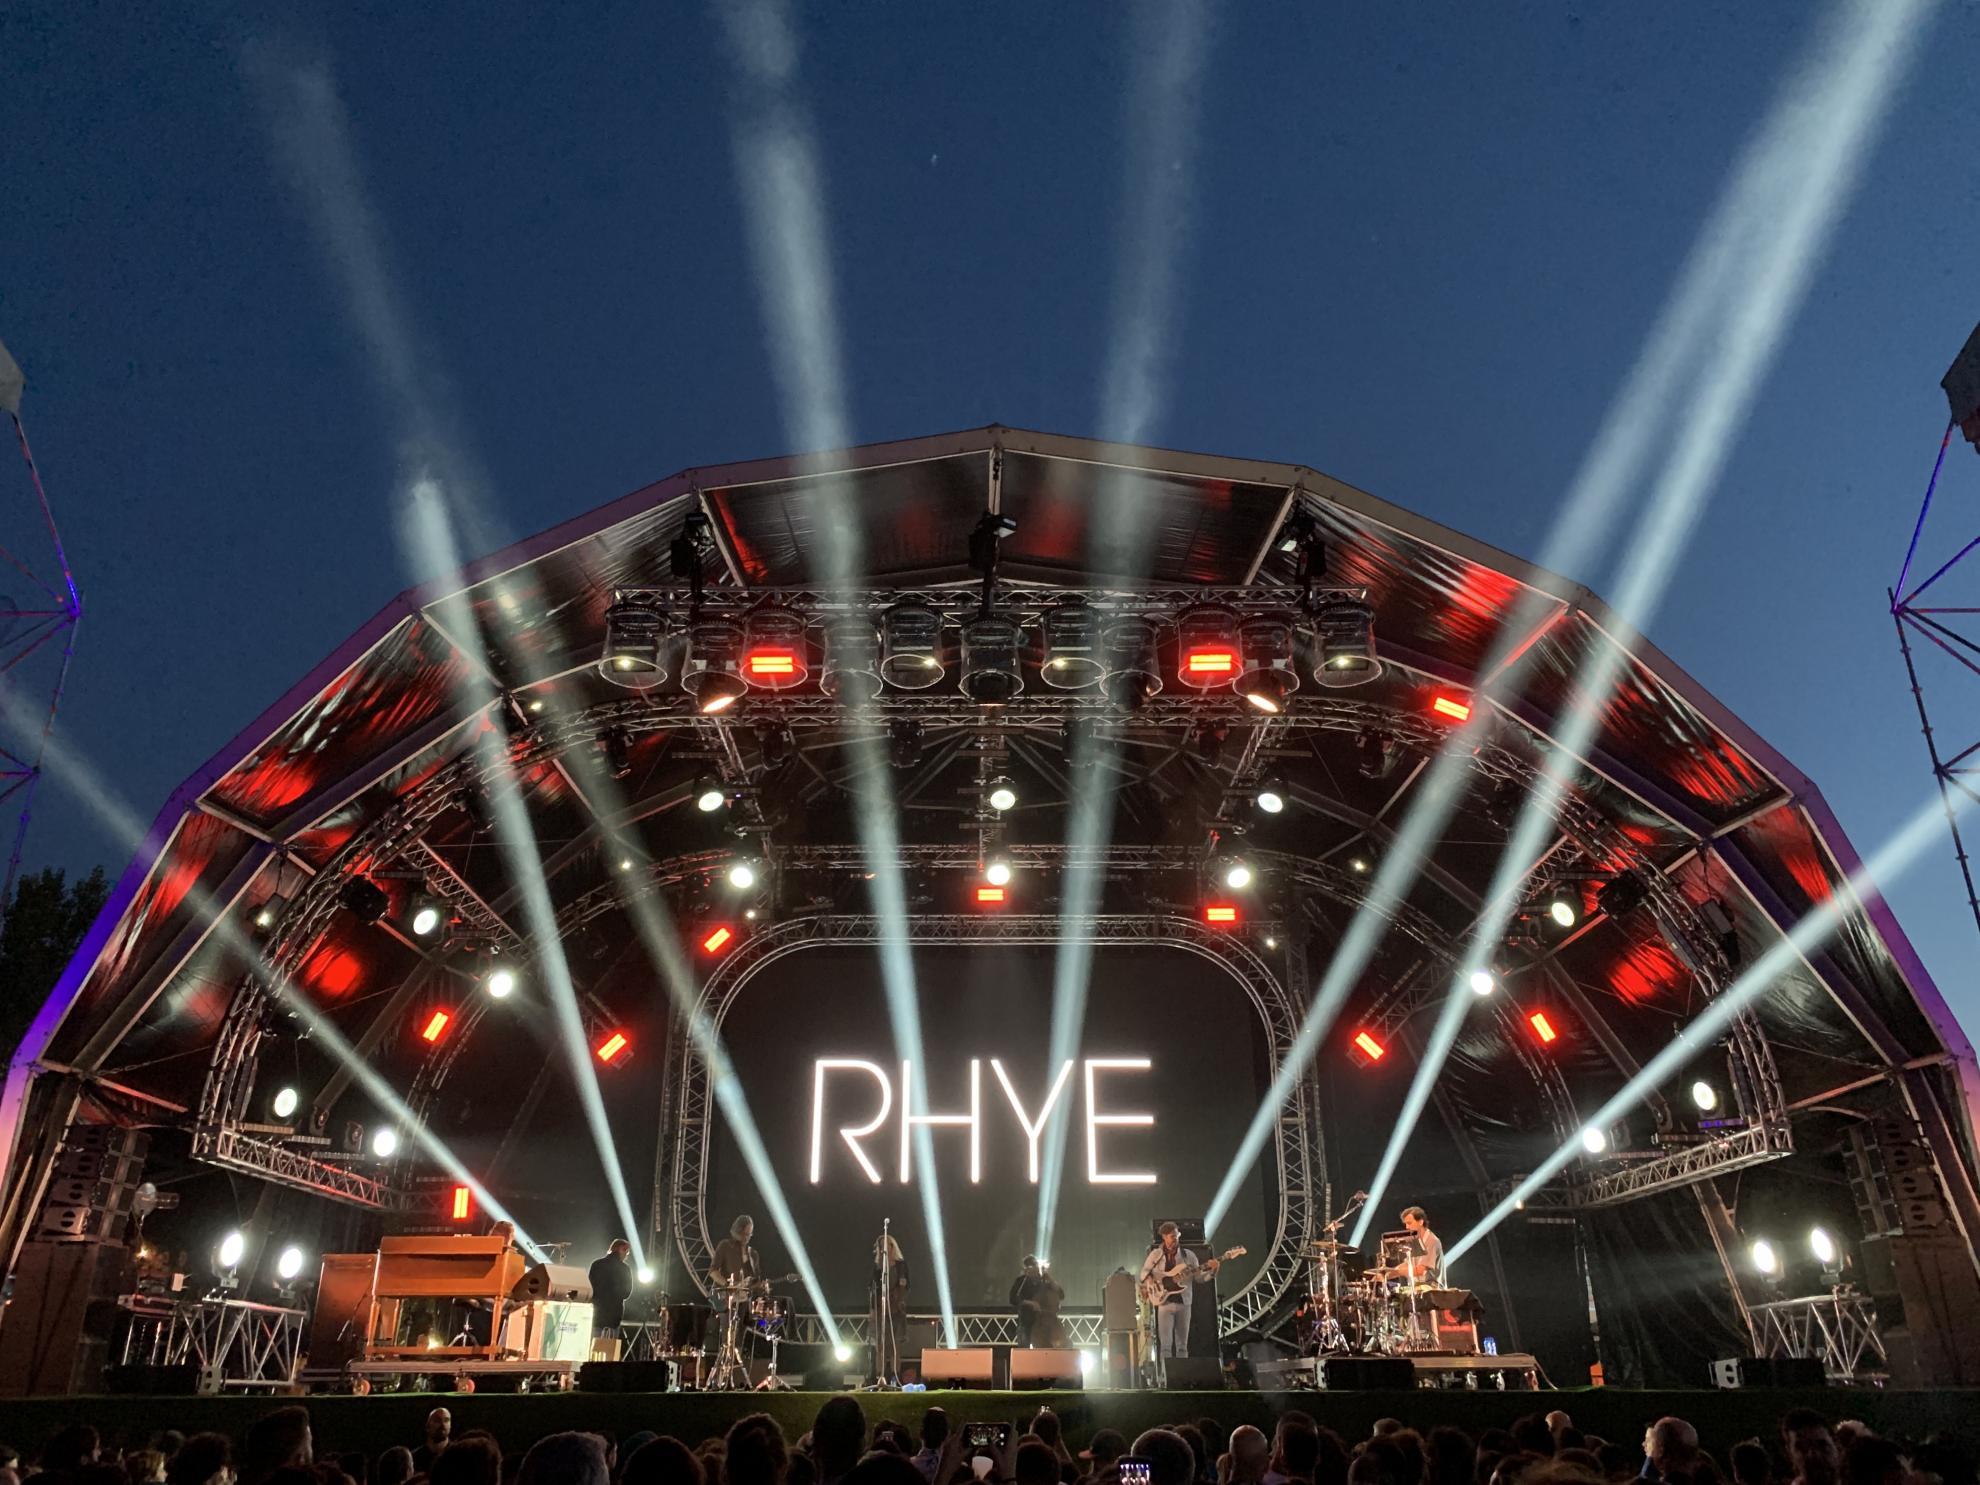 Rhye (Paraíso Festival 2019 by Fanmusicfest)